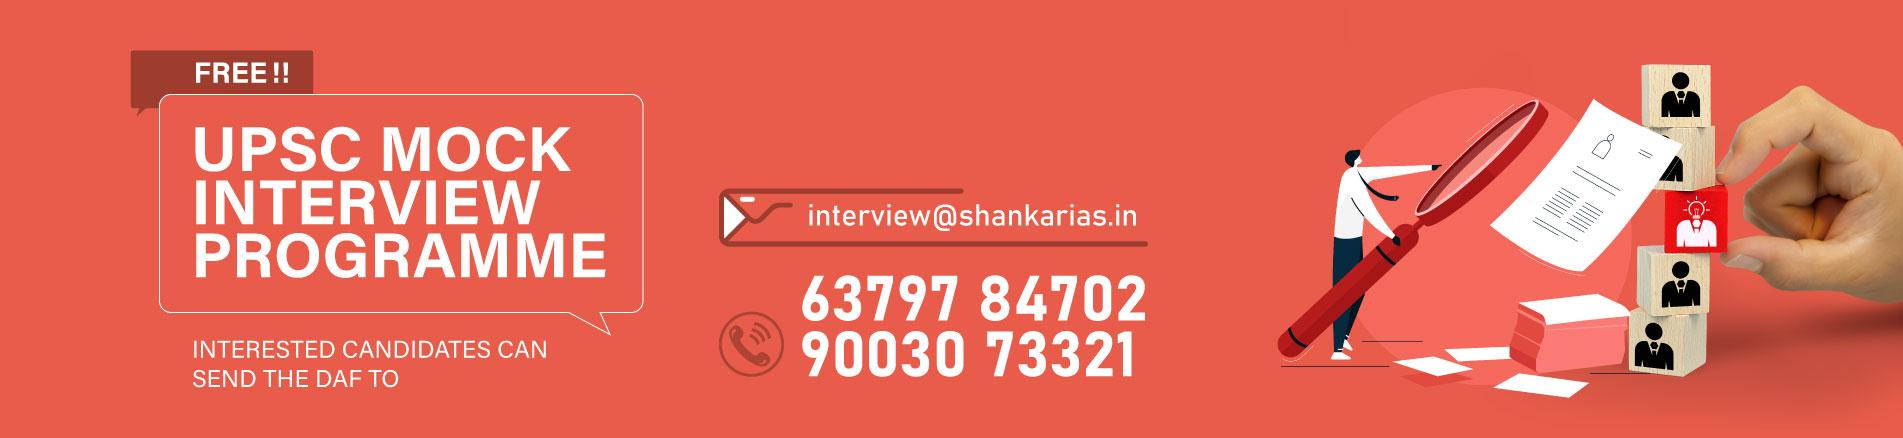 Free Interview